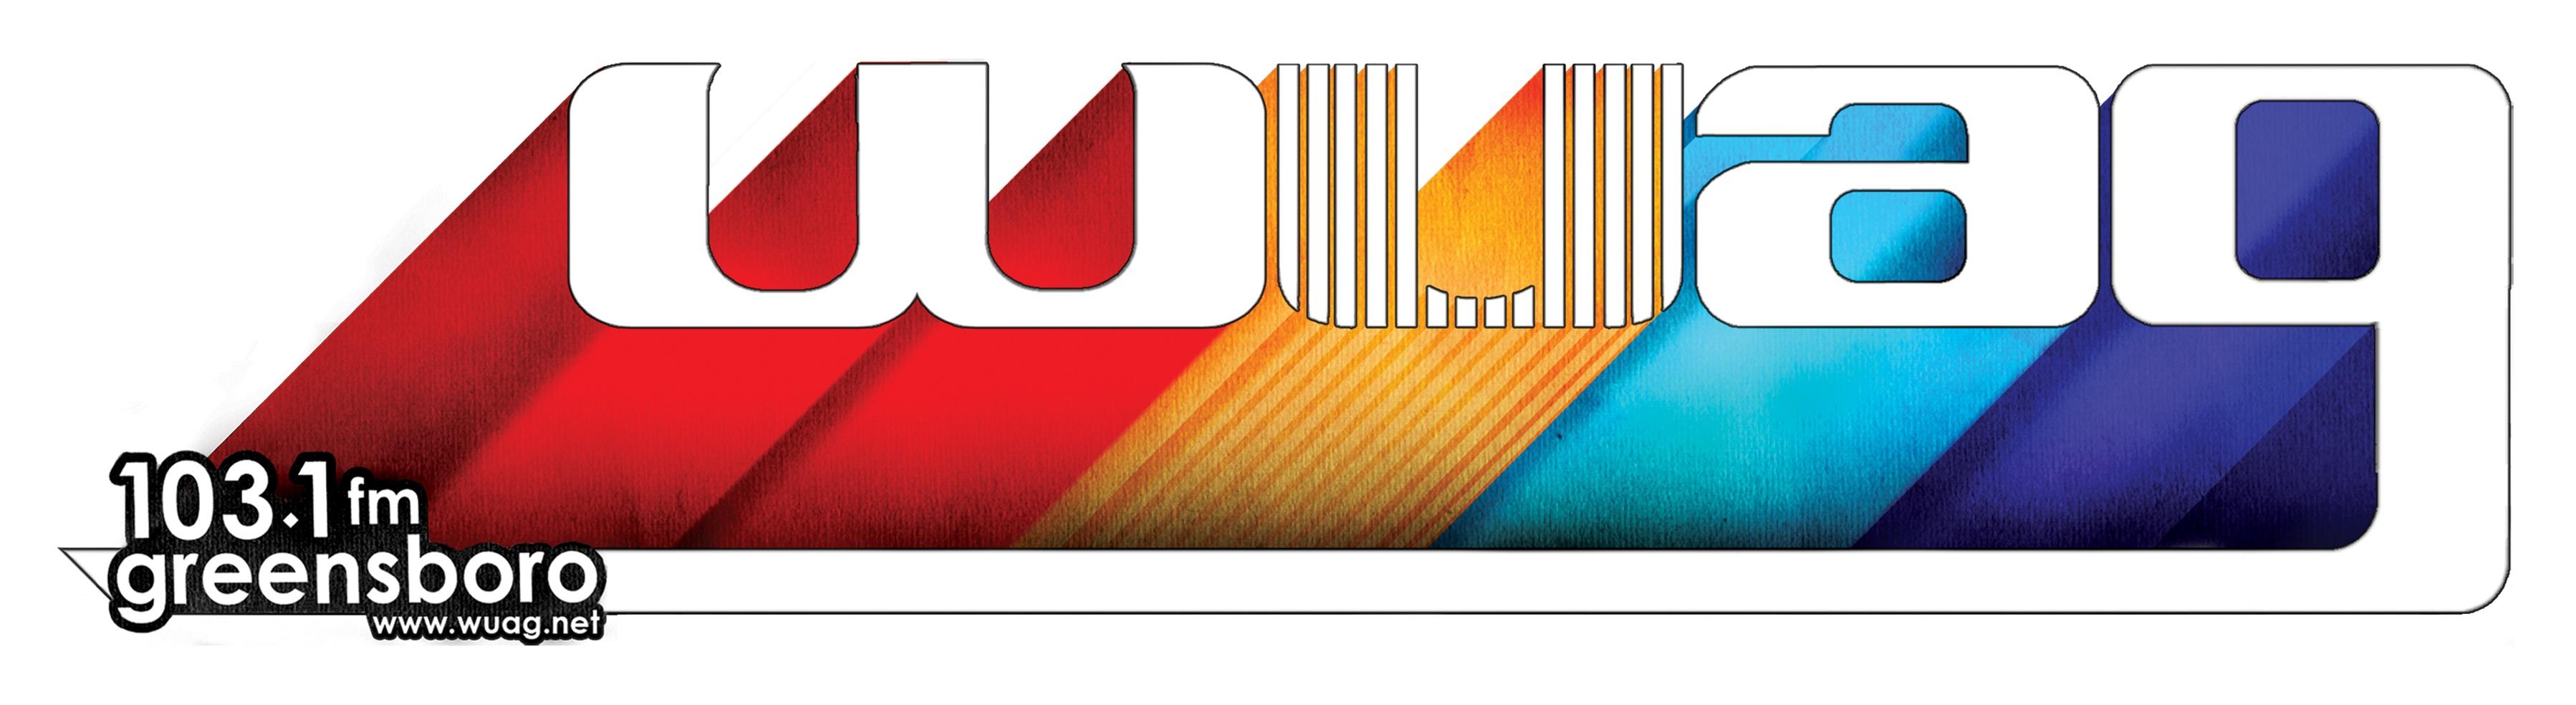 logoWUAG-1.jpg